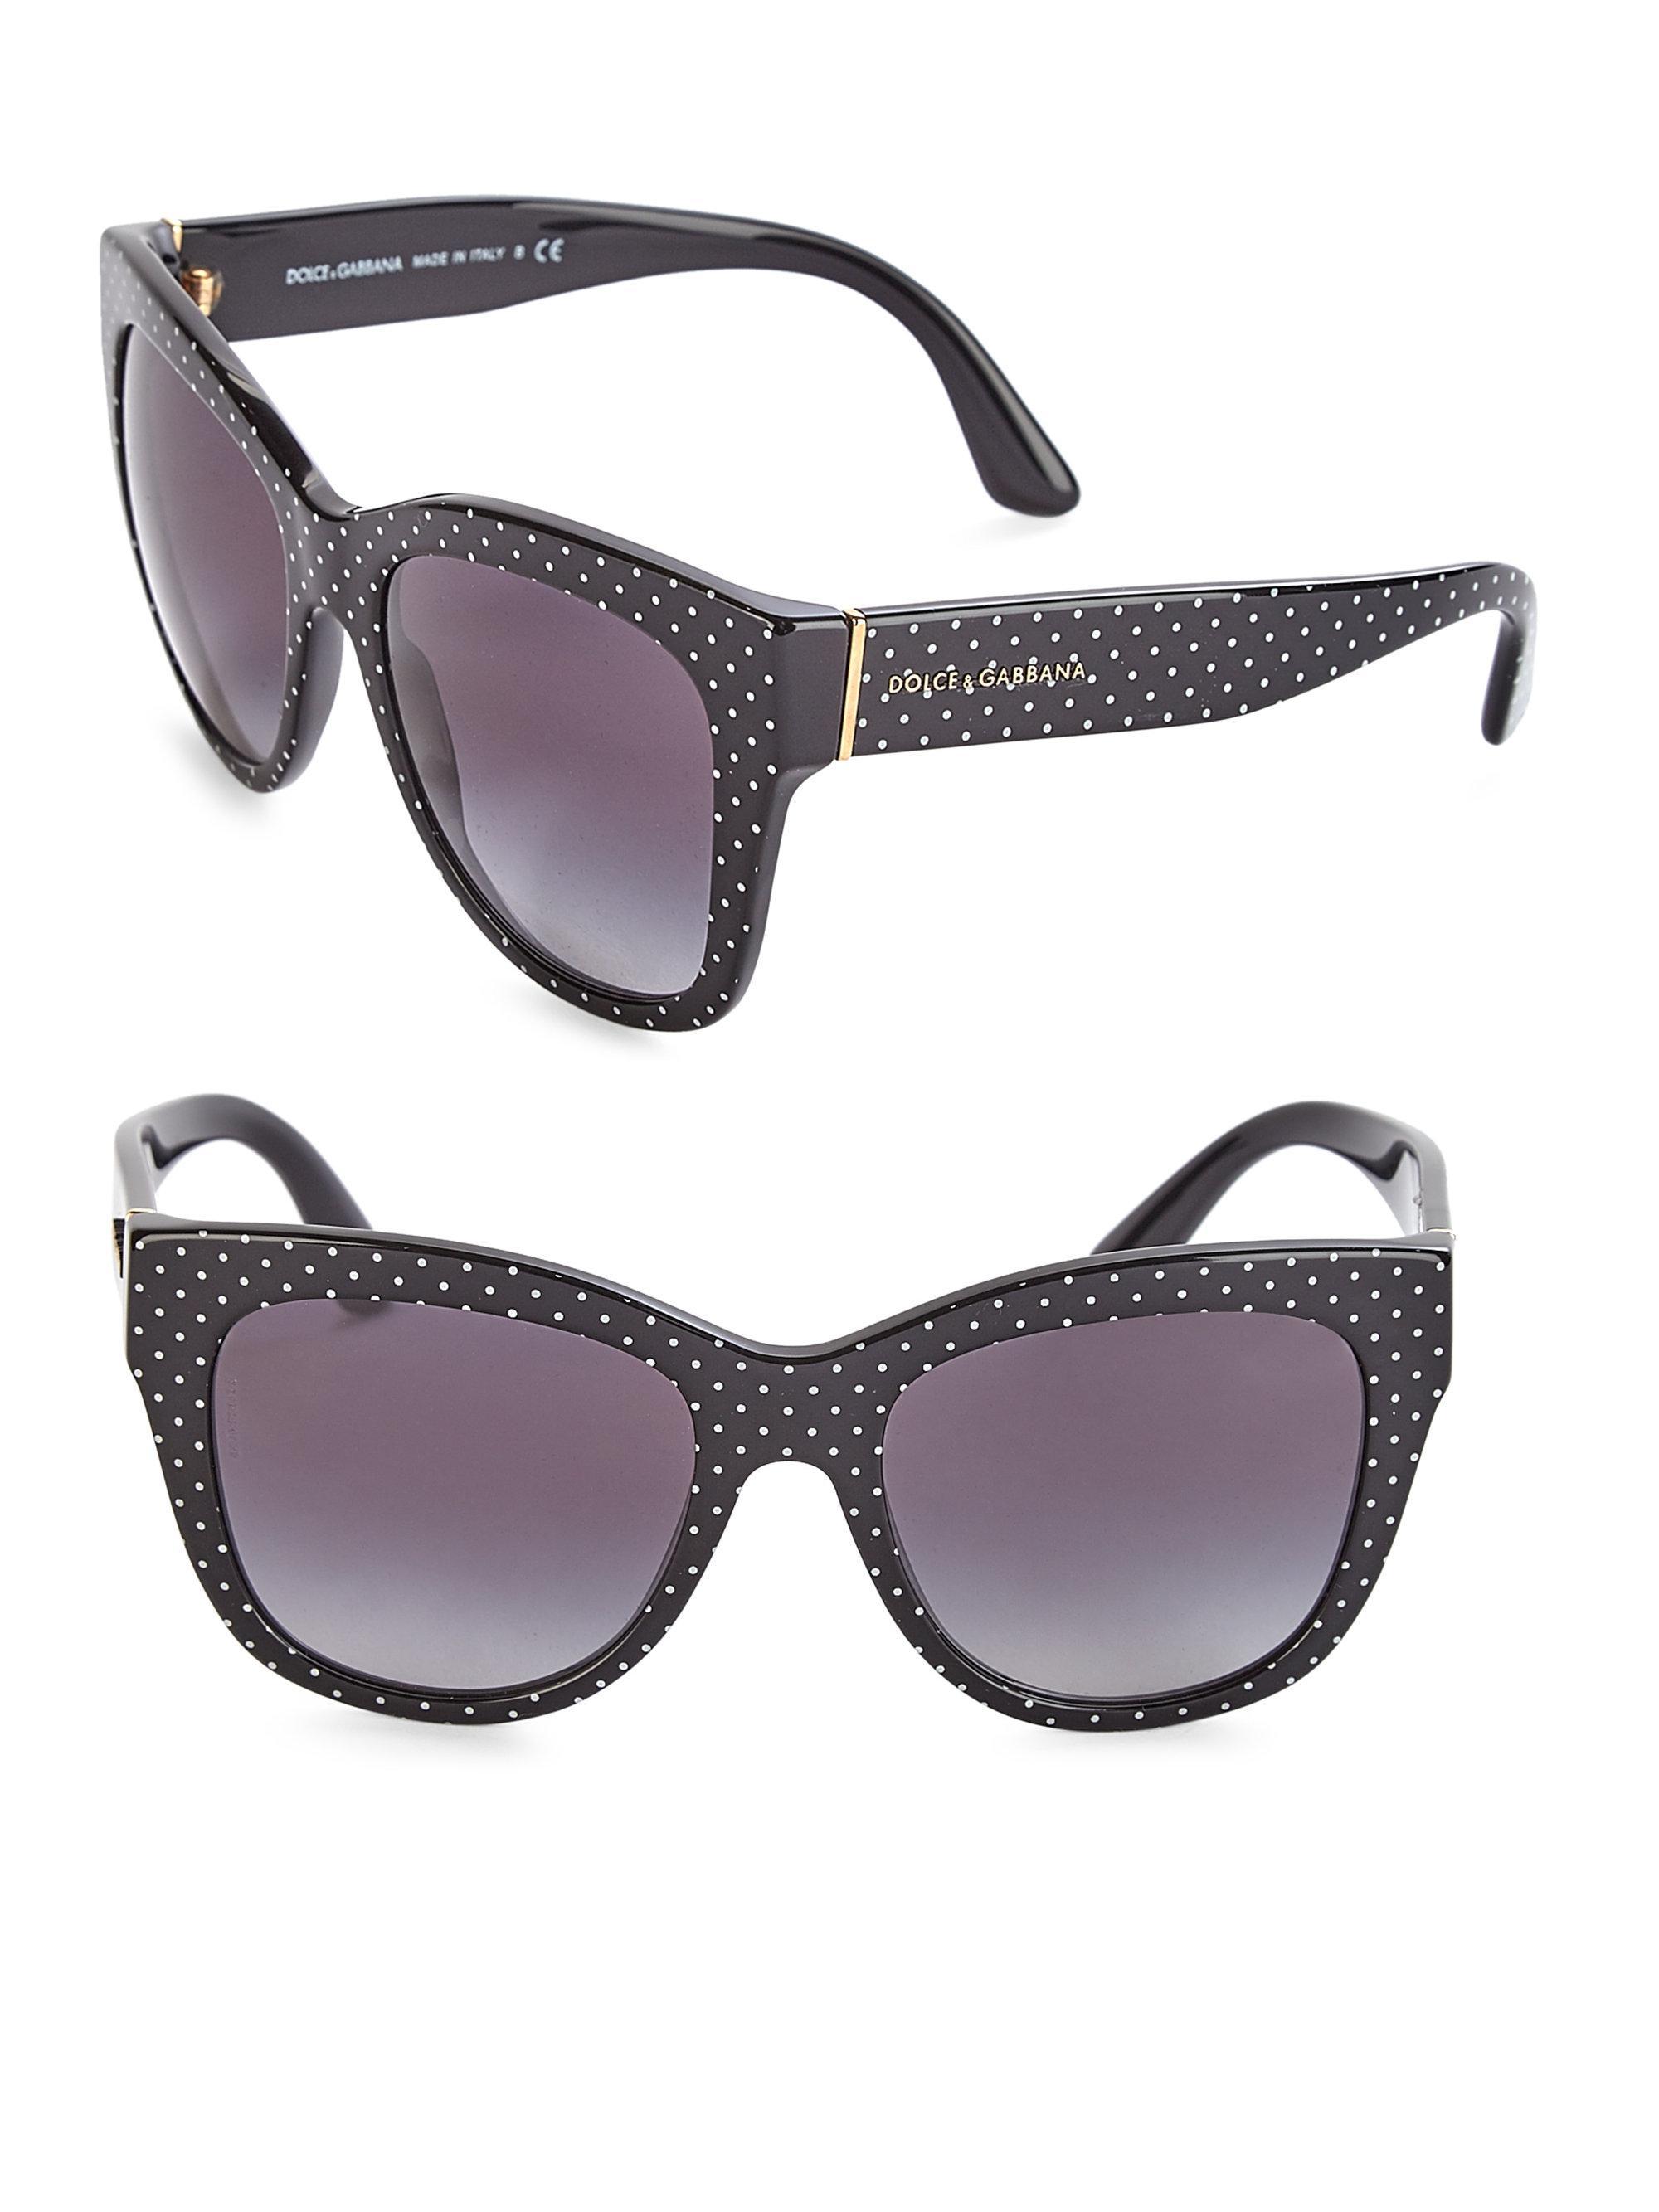 6b37e29980dd Lyst - Dolce & Gabbana 55mm Square Floral Acetate Sunglasses